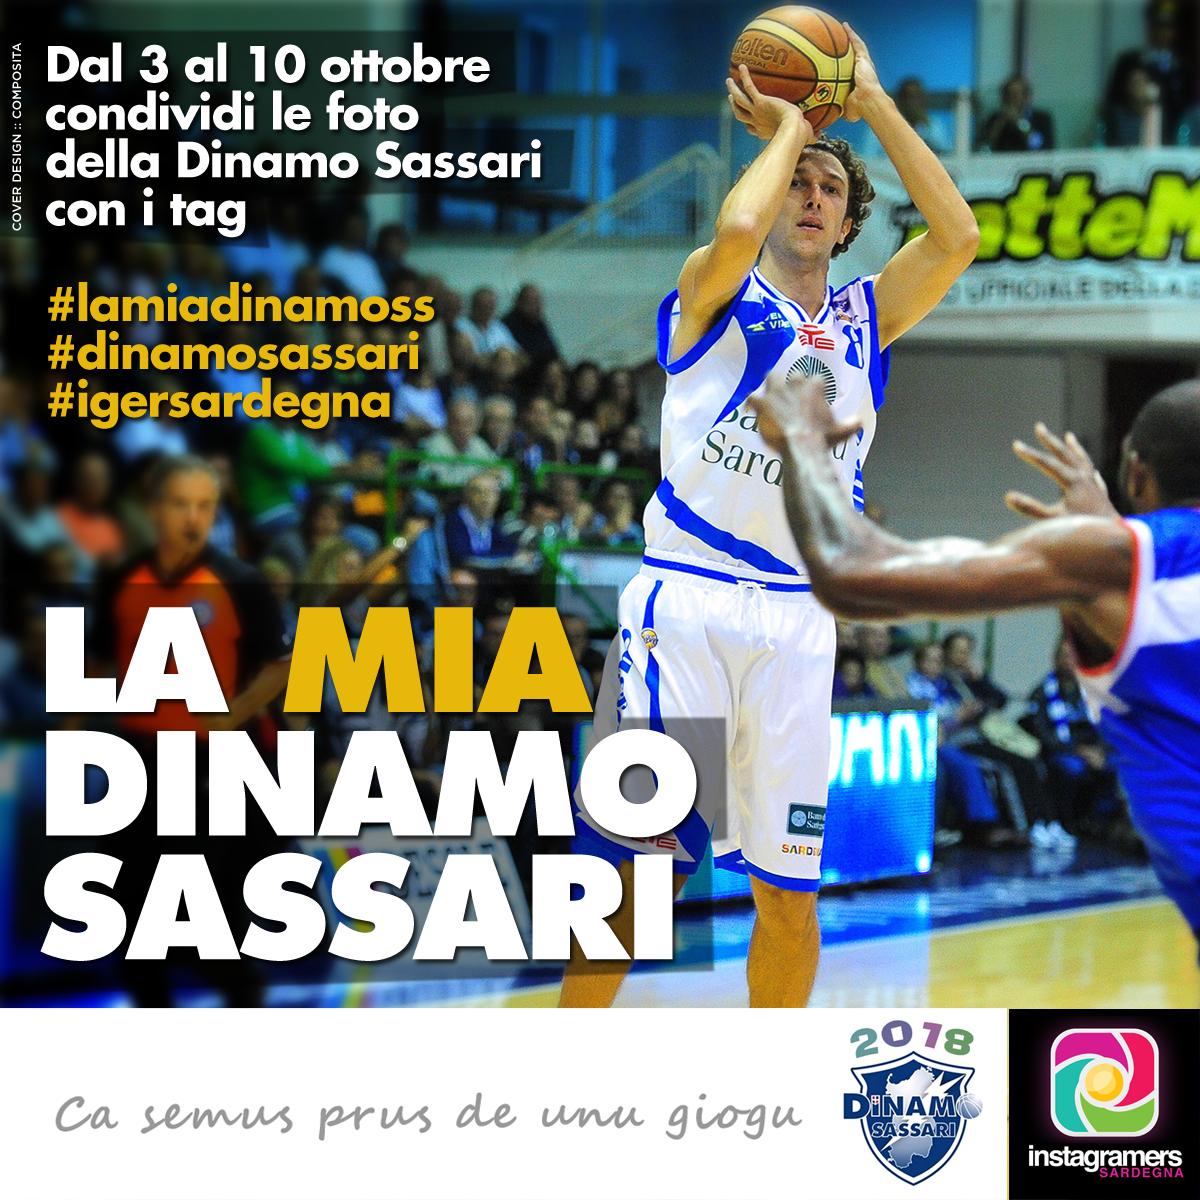 La Dinamo Sassari sbarca su Instagram con @igers_sardegna